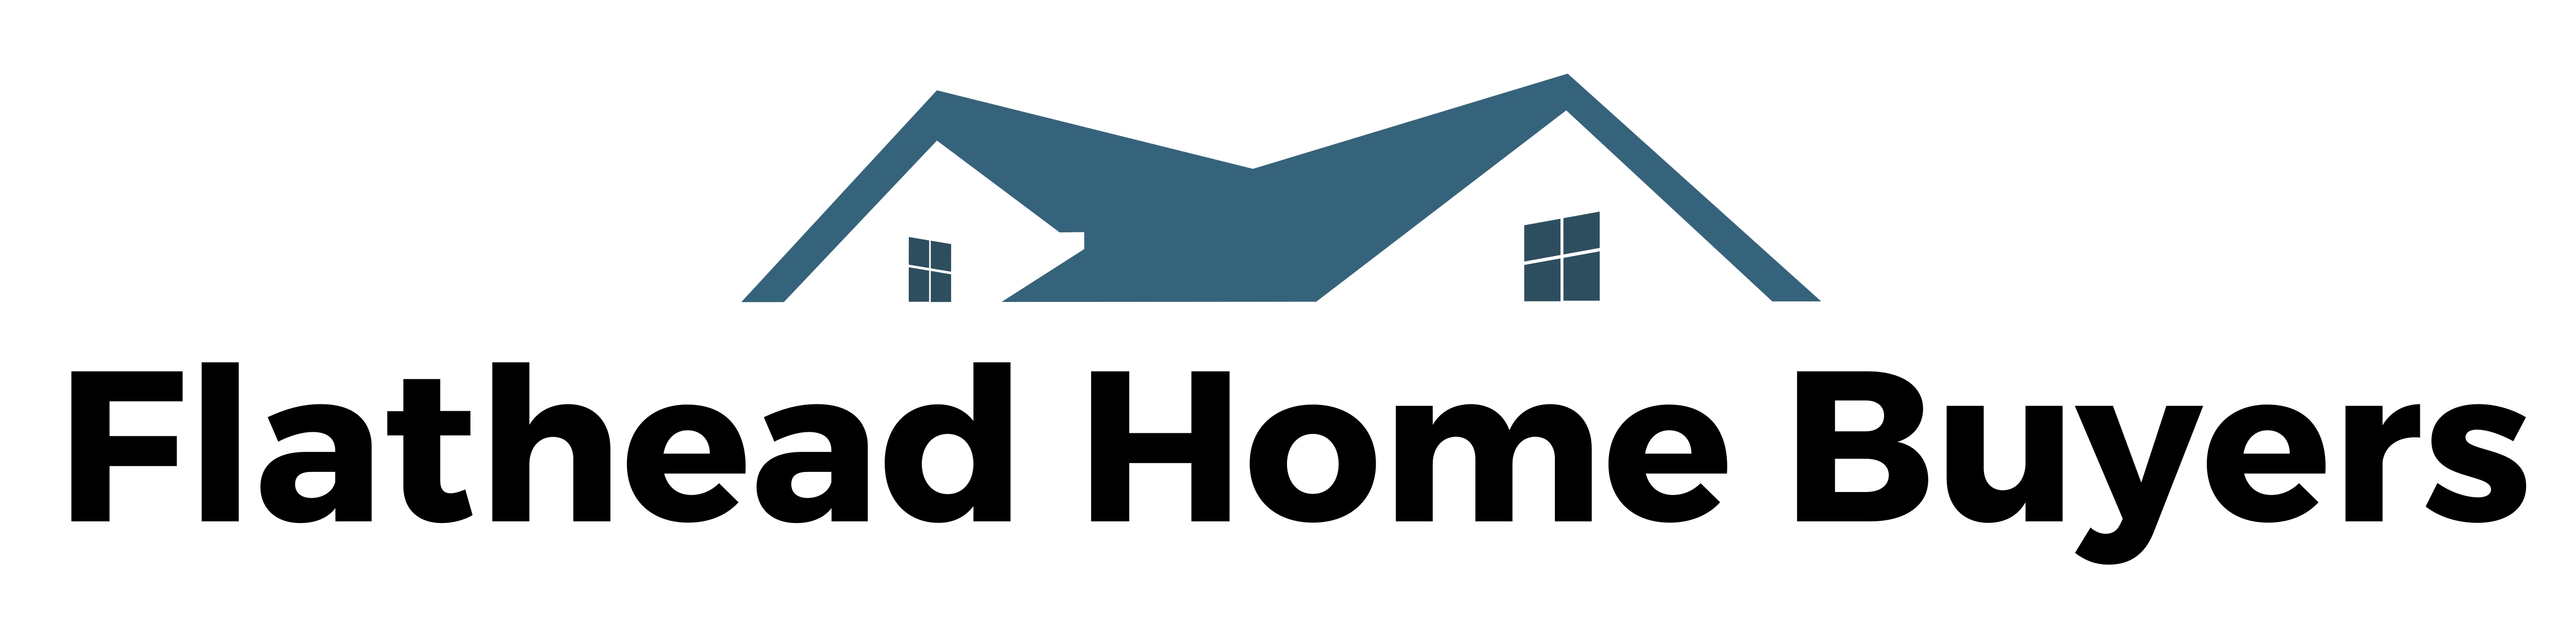 UNDER CONSTRUCTION - Flathead Home Buyers